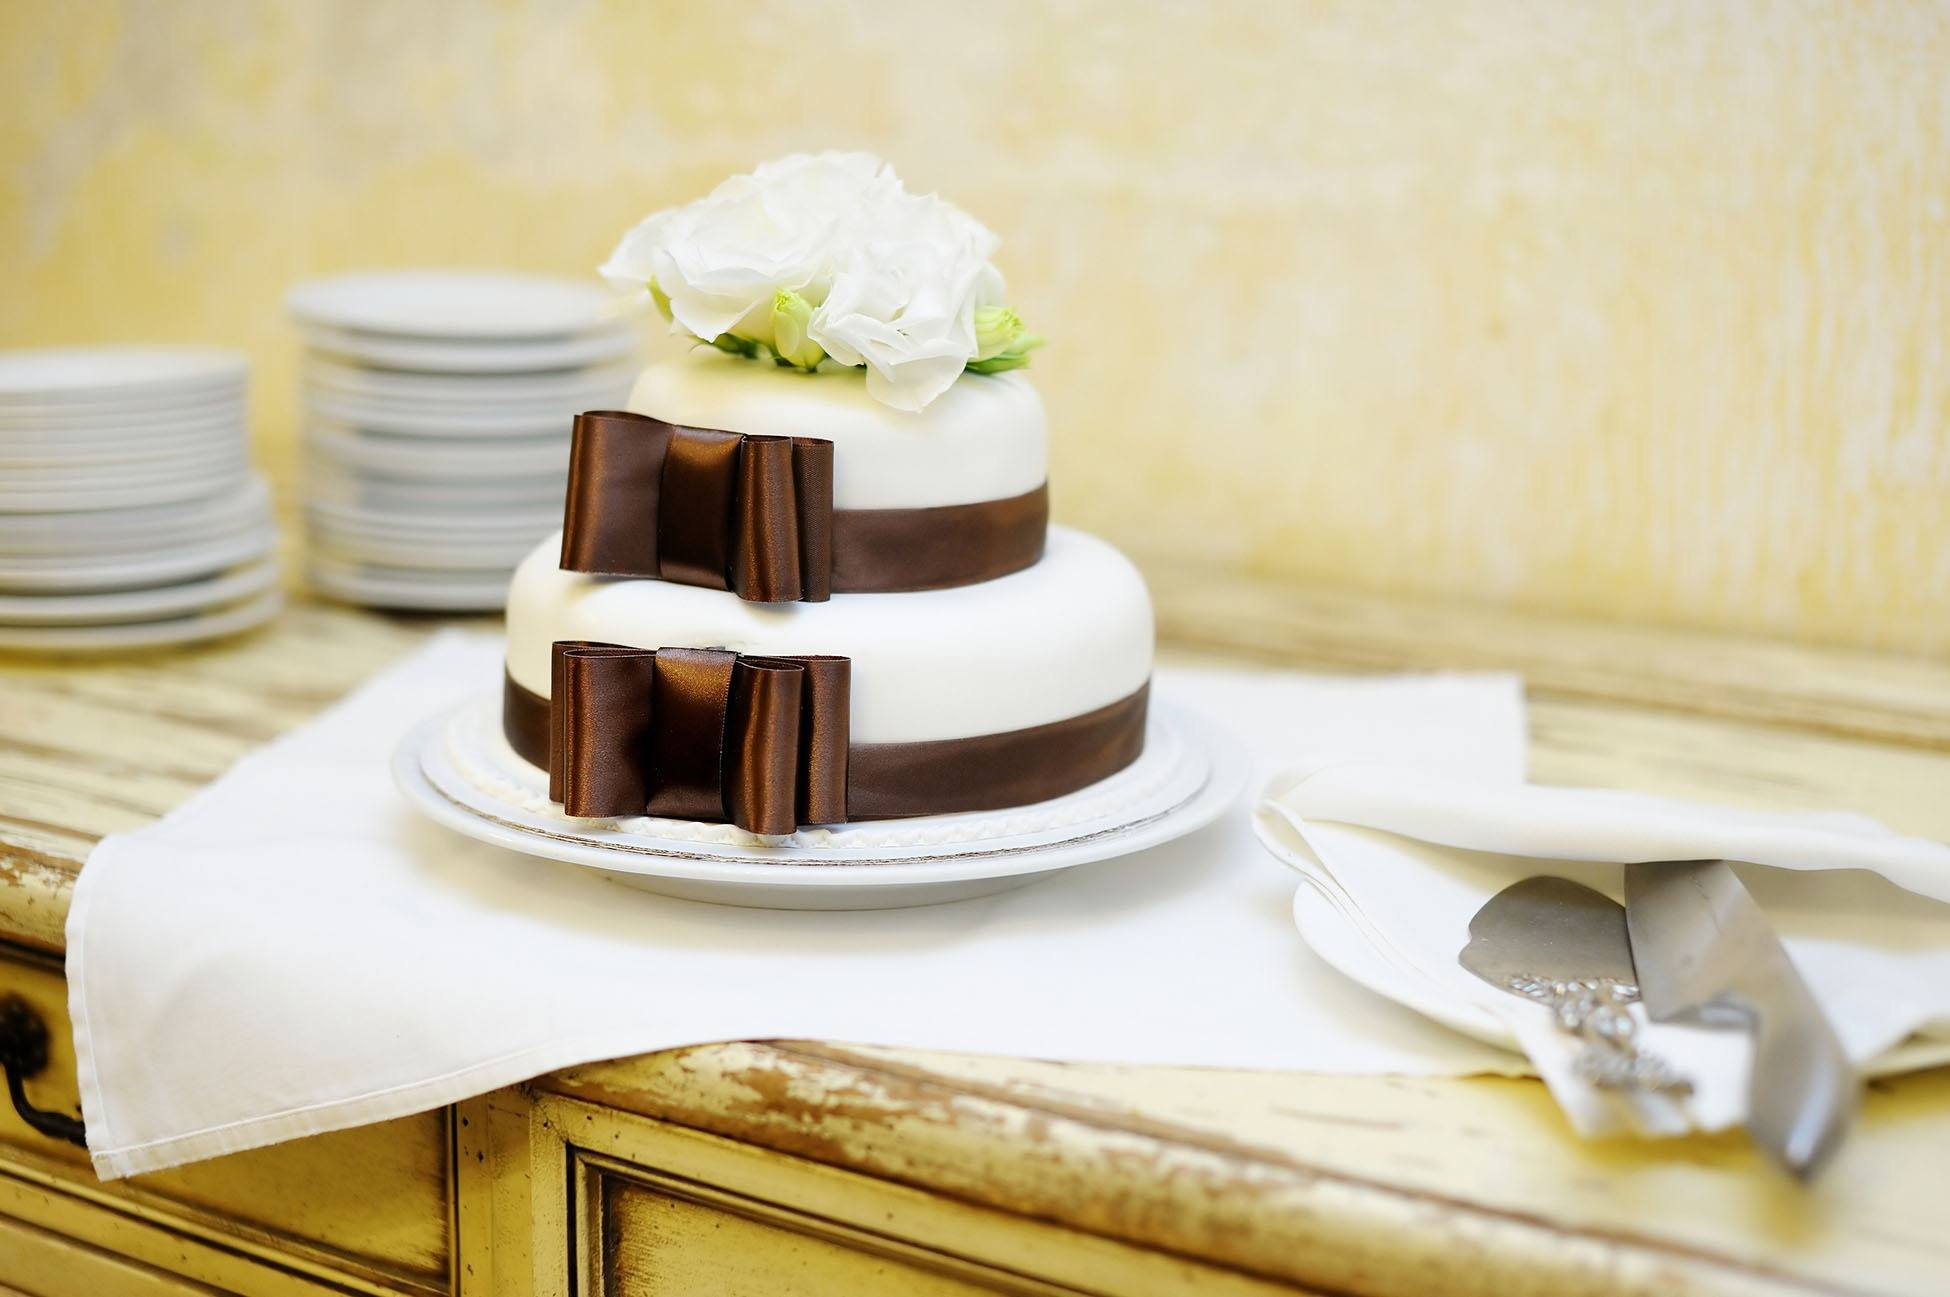 Patrový bílo-hnědý dort